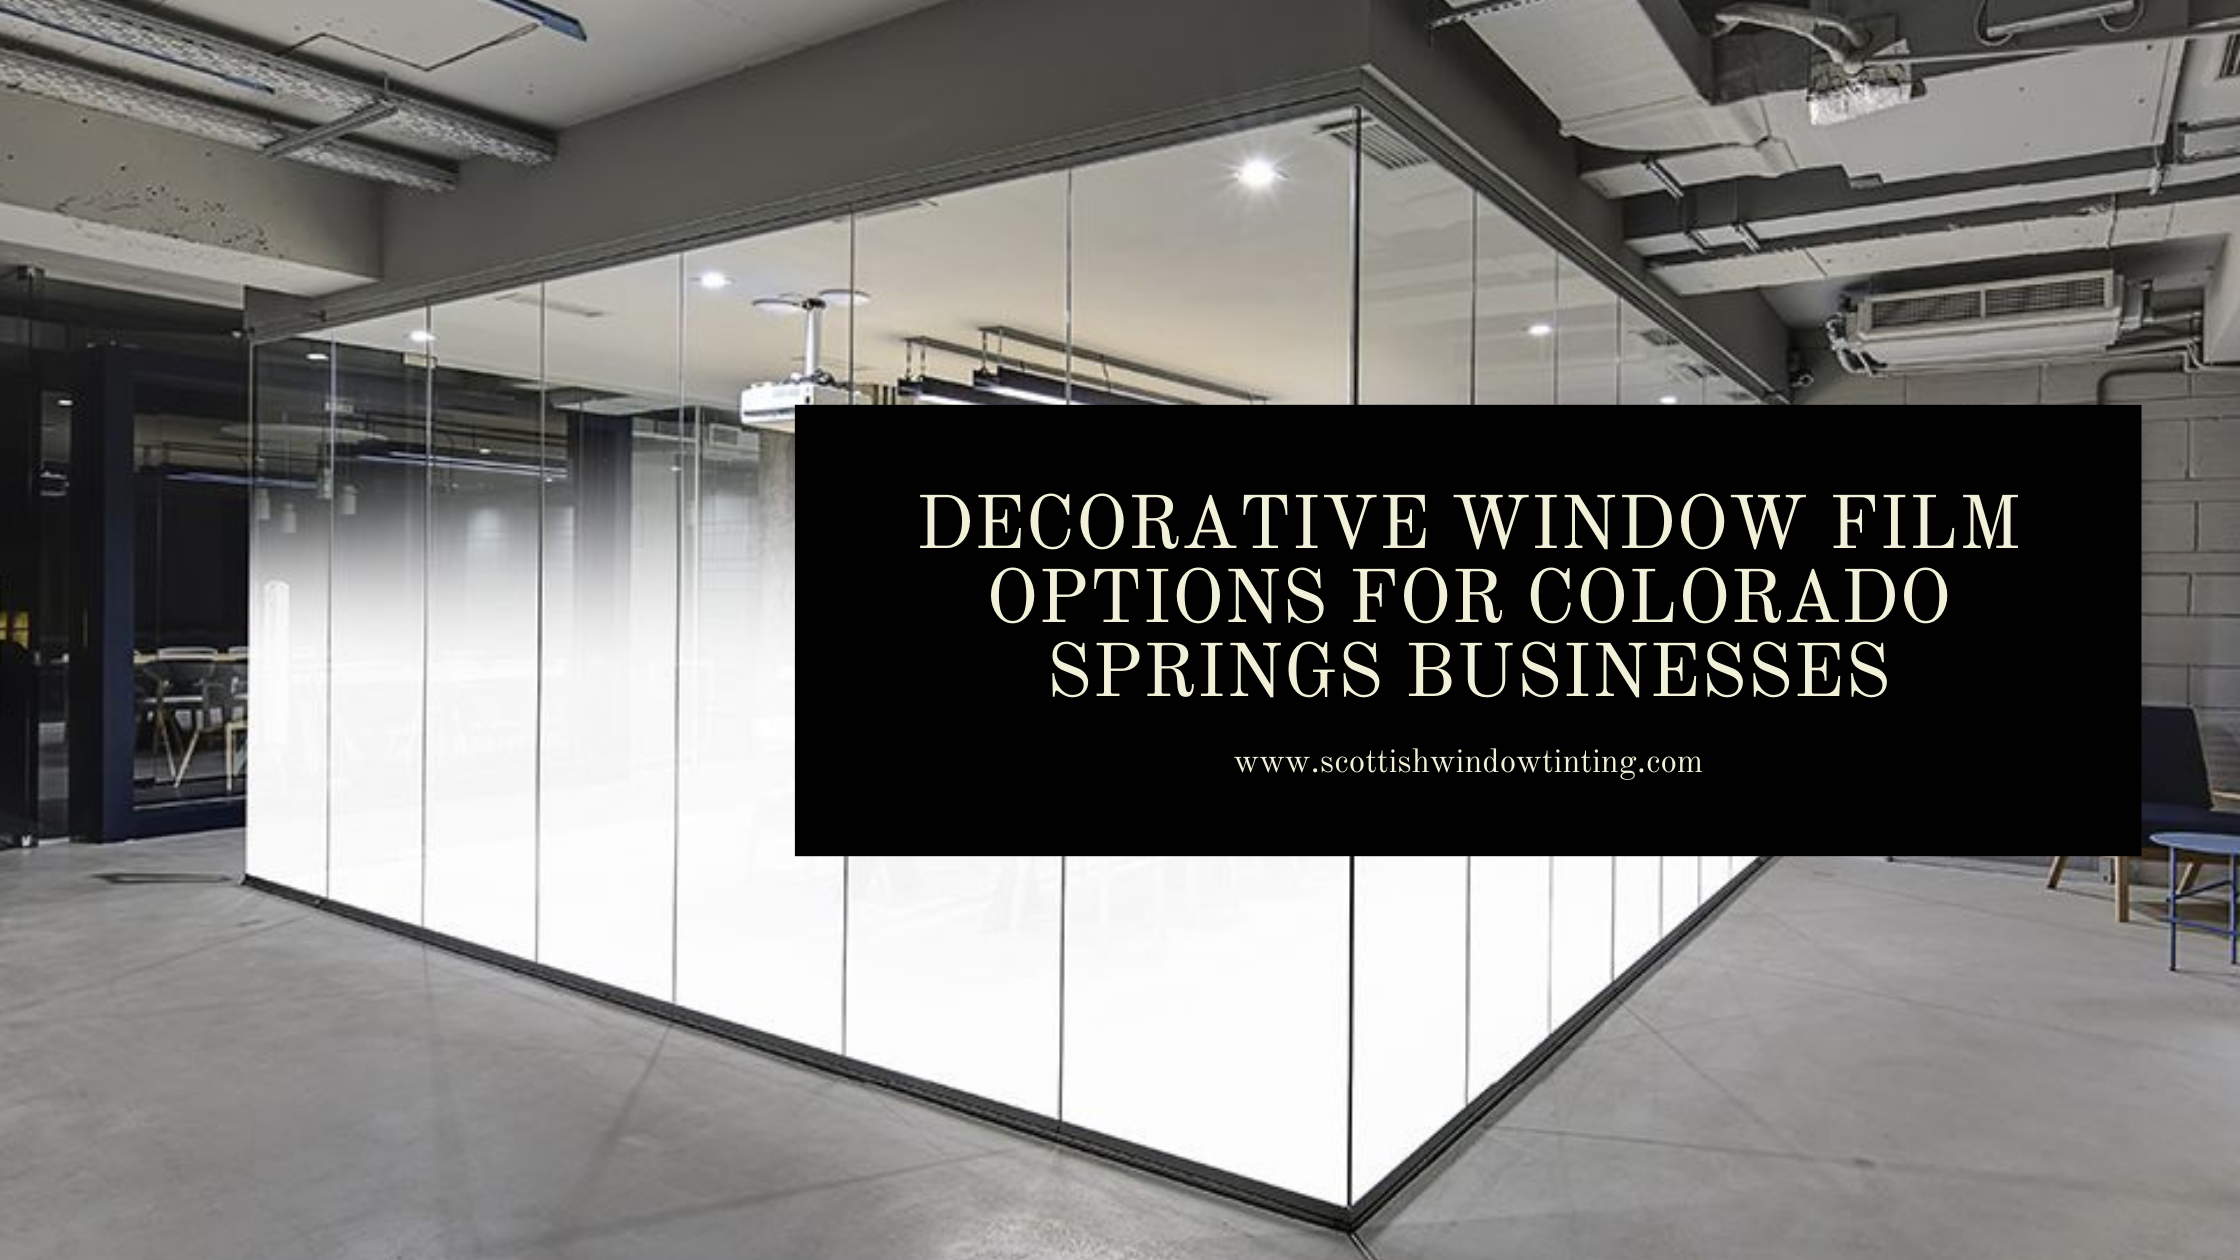 Decorative Window Film Options for Colorado Springs Businesses